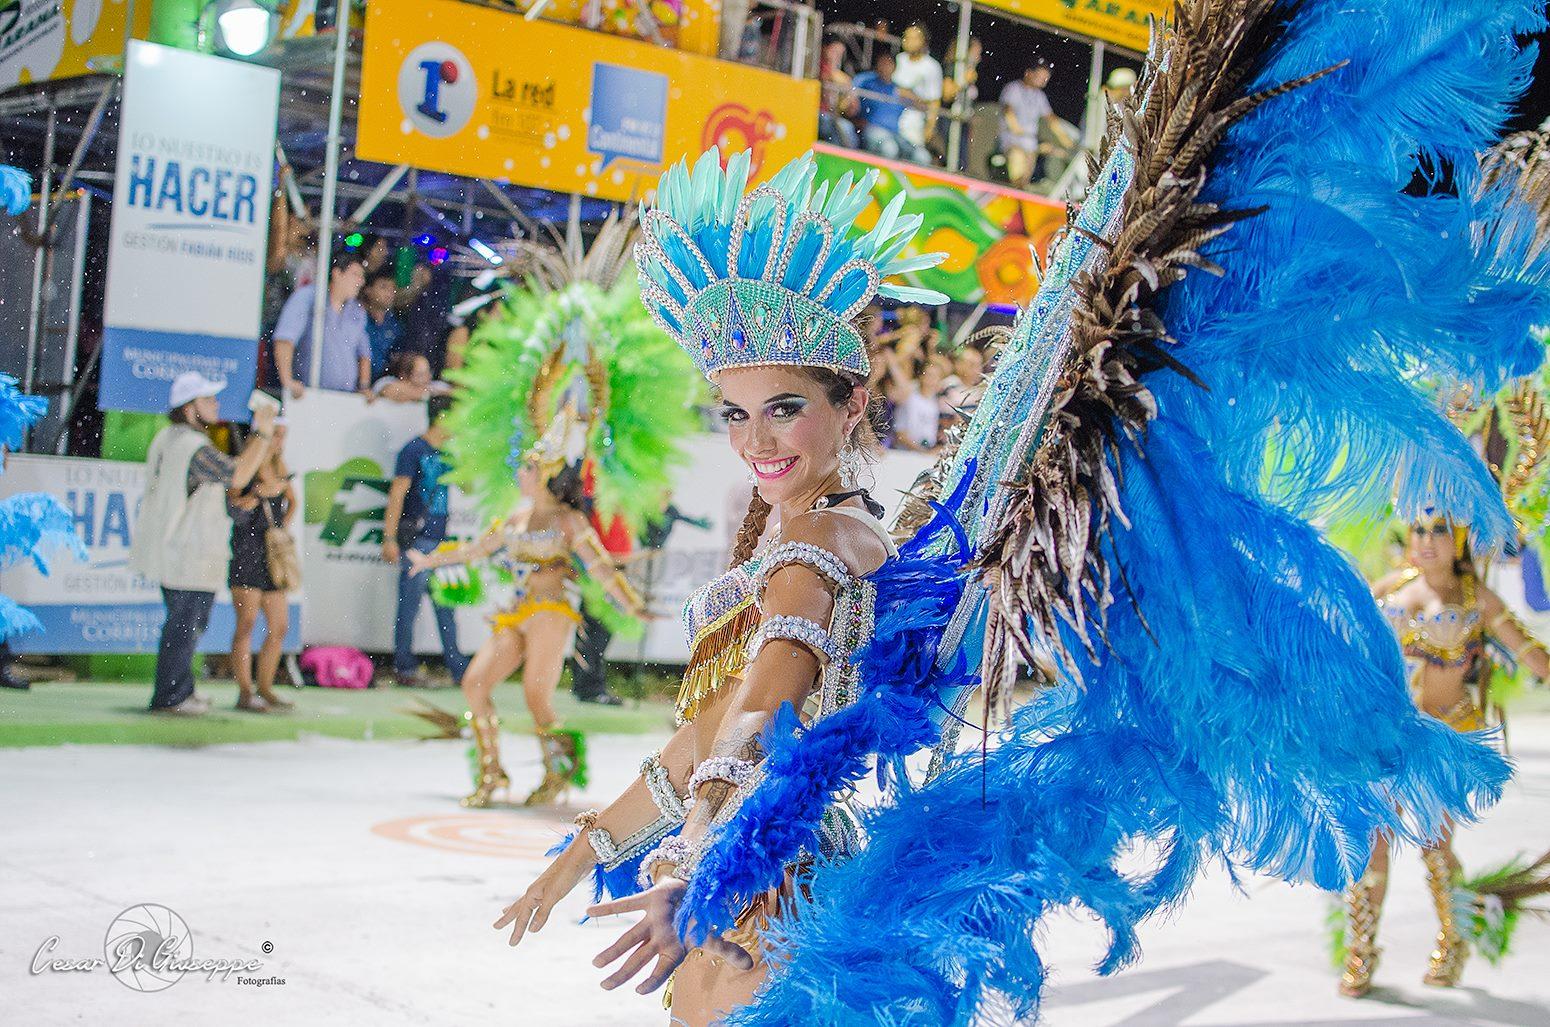 carnaval by cesar di giuseppe